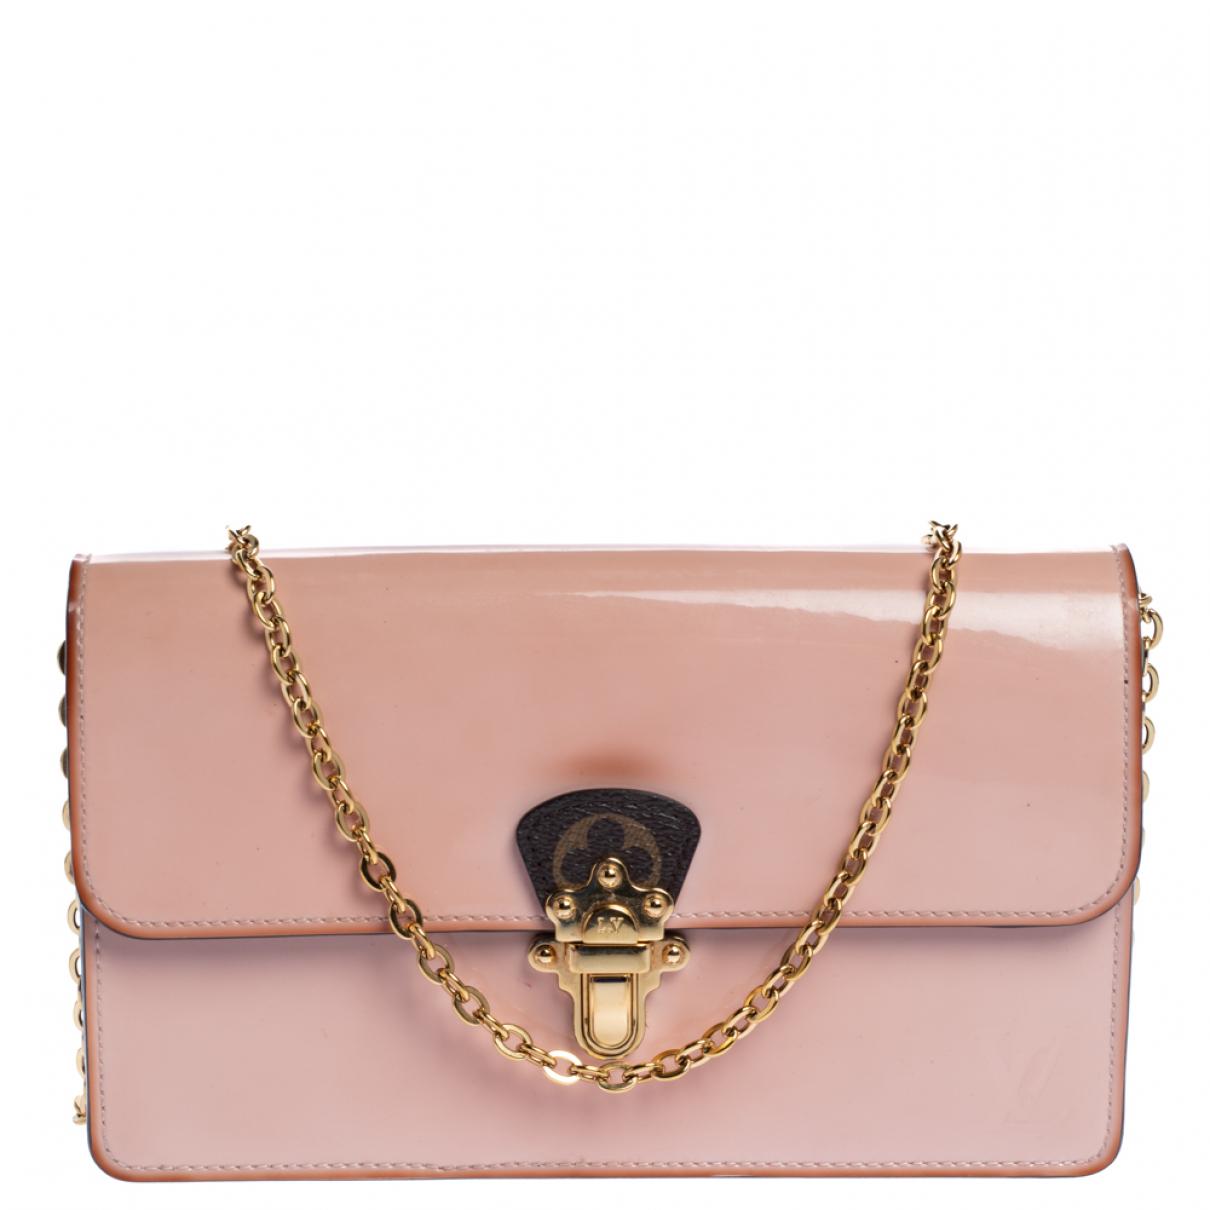 Cartera Cherrywood de Cuero Louis Vuitton